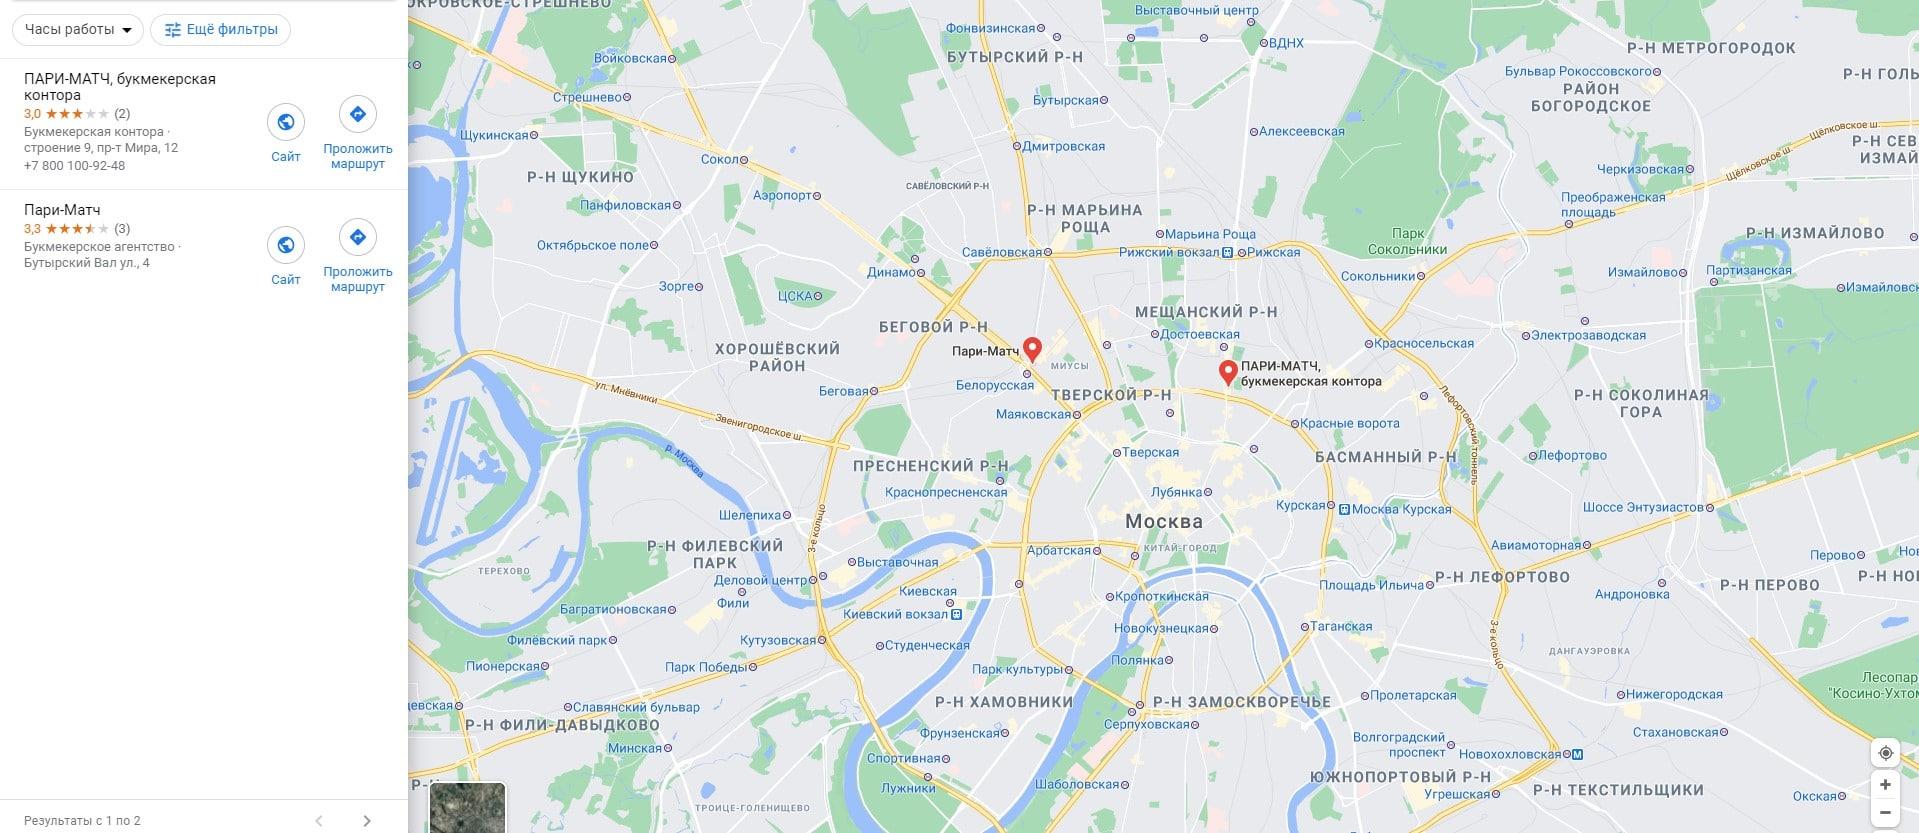 Париматч офисы Москва